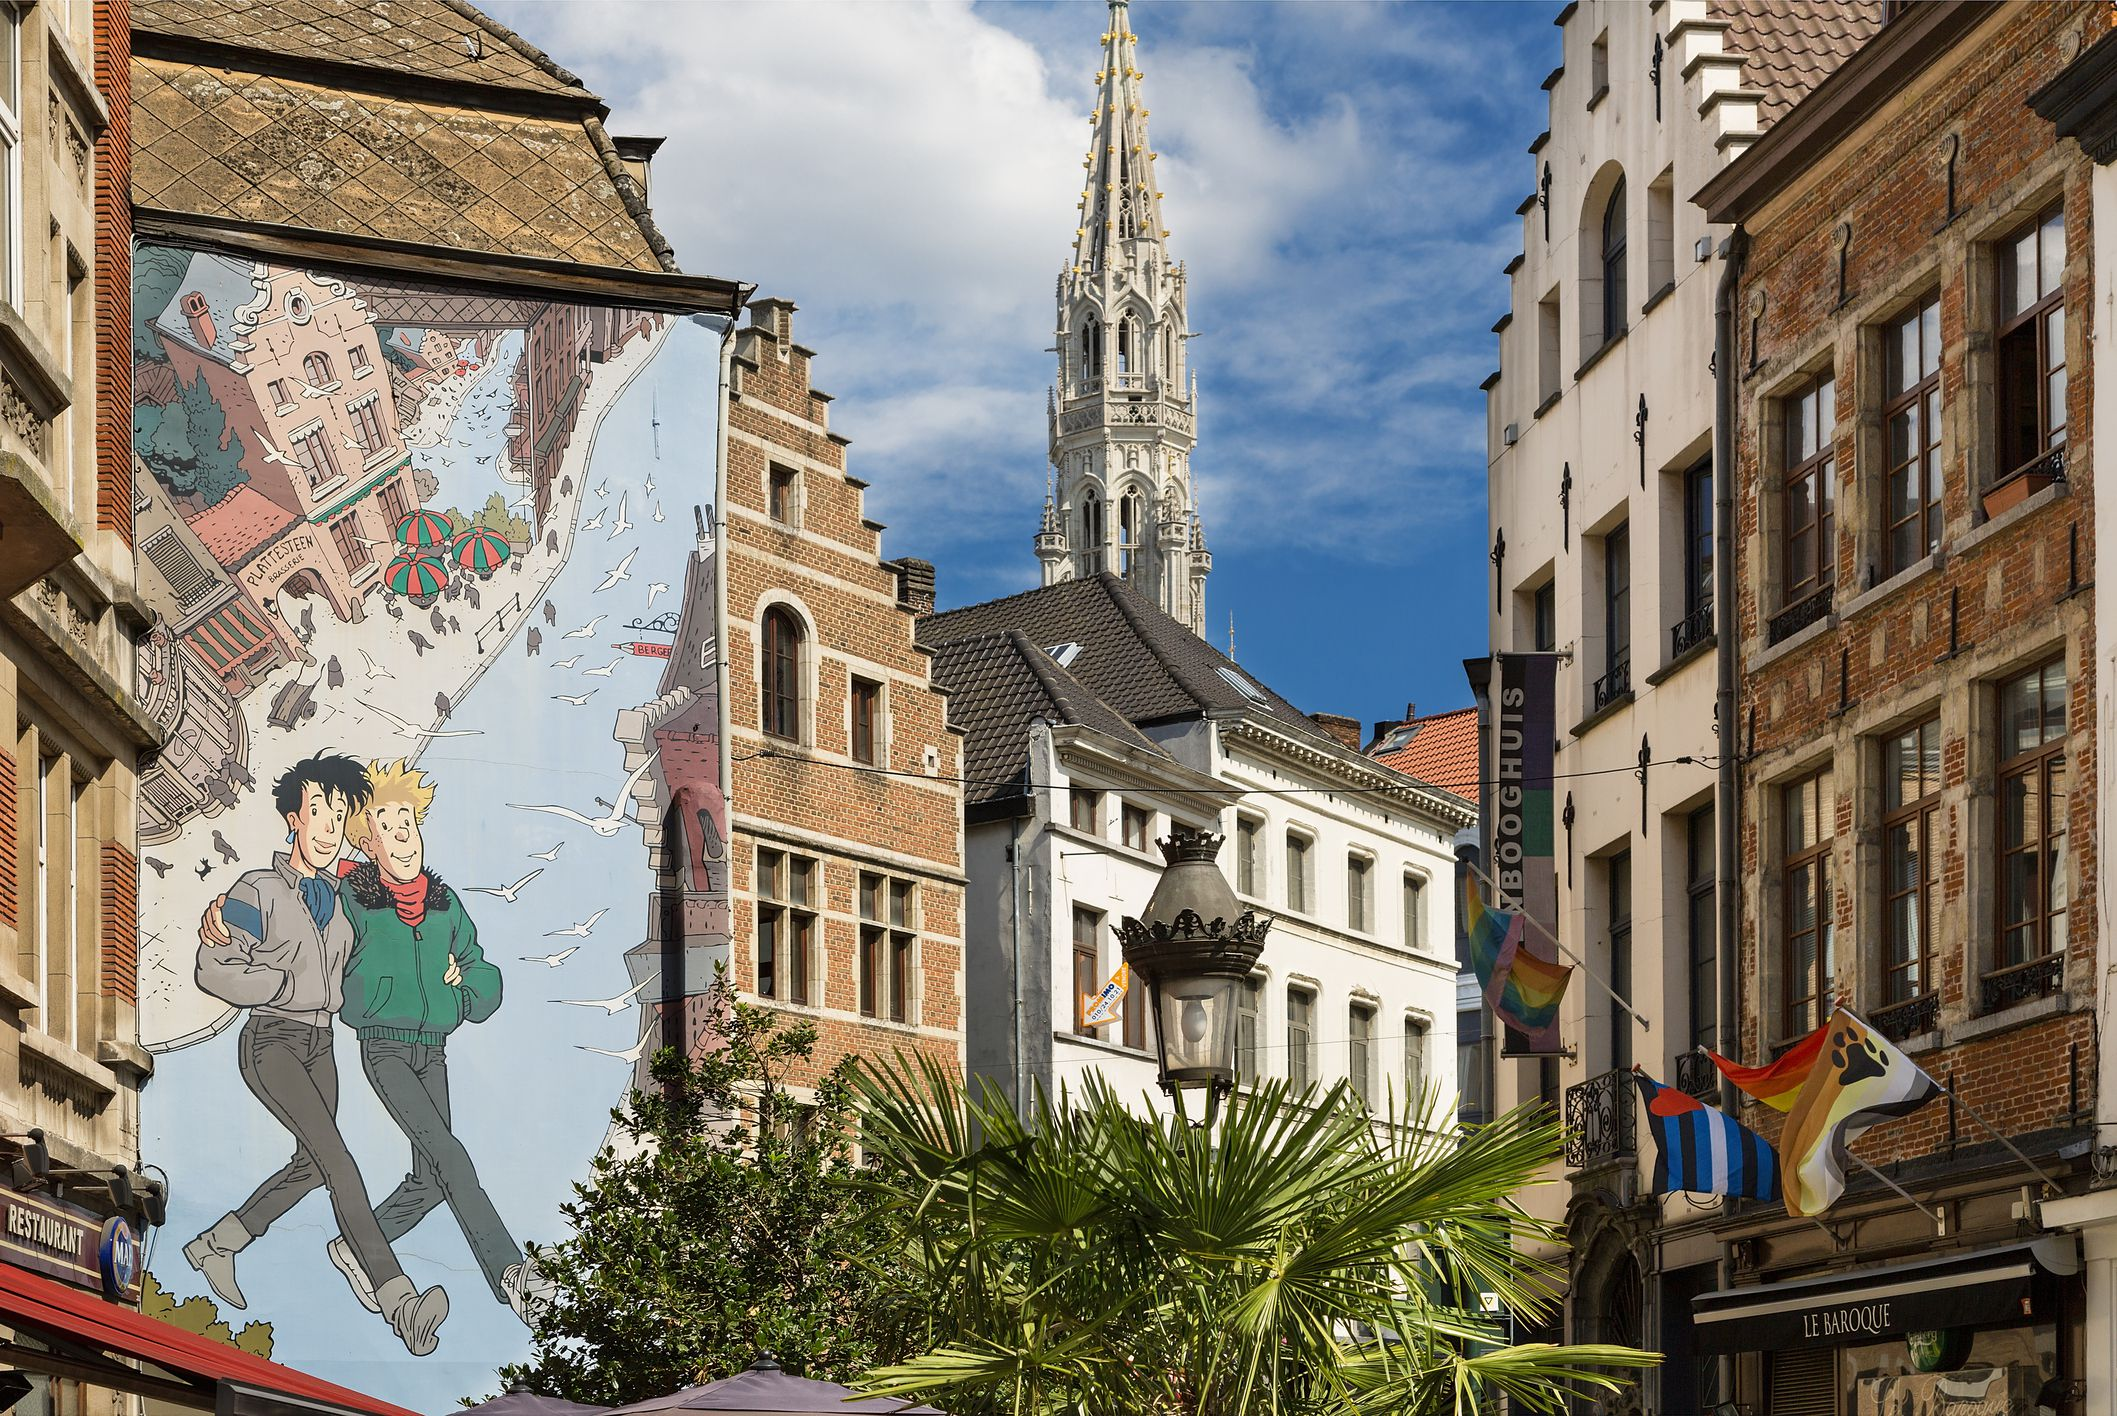 NGÀY 06 : ANTWERP - BRUGES - BRUSSELS